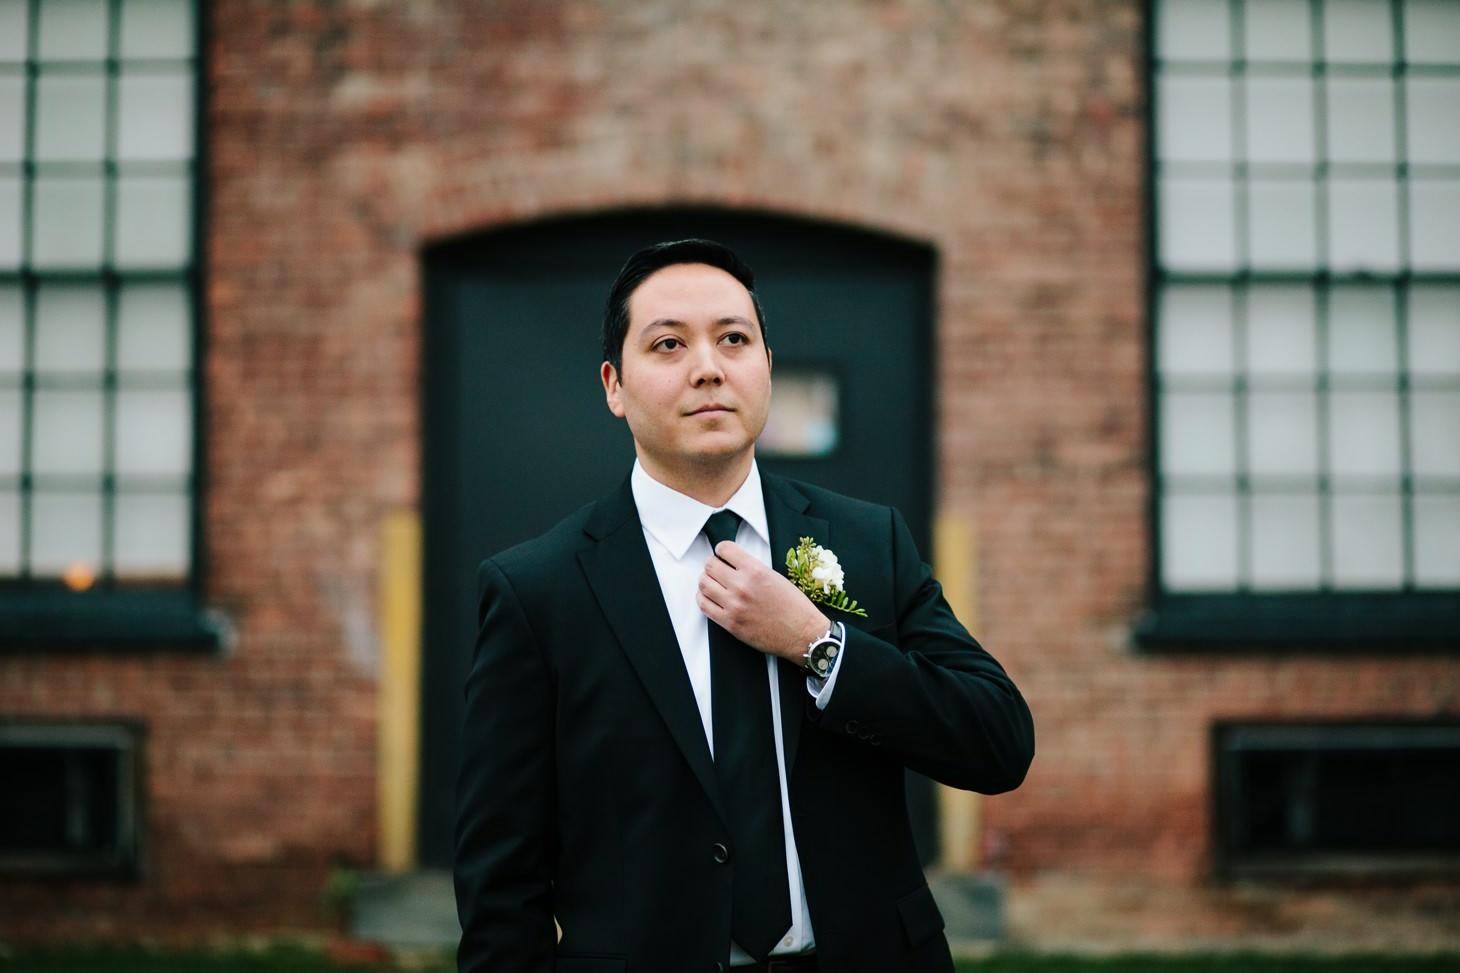 021-nyc-wedding-photographer-beacon-roundhouse-.jpg